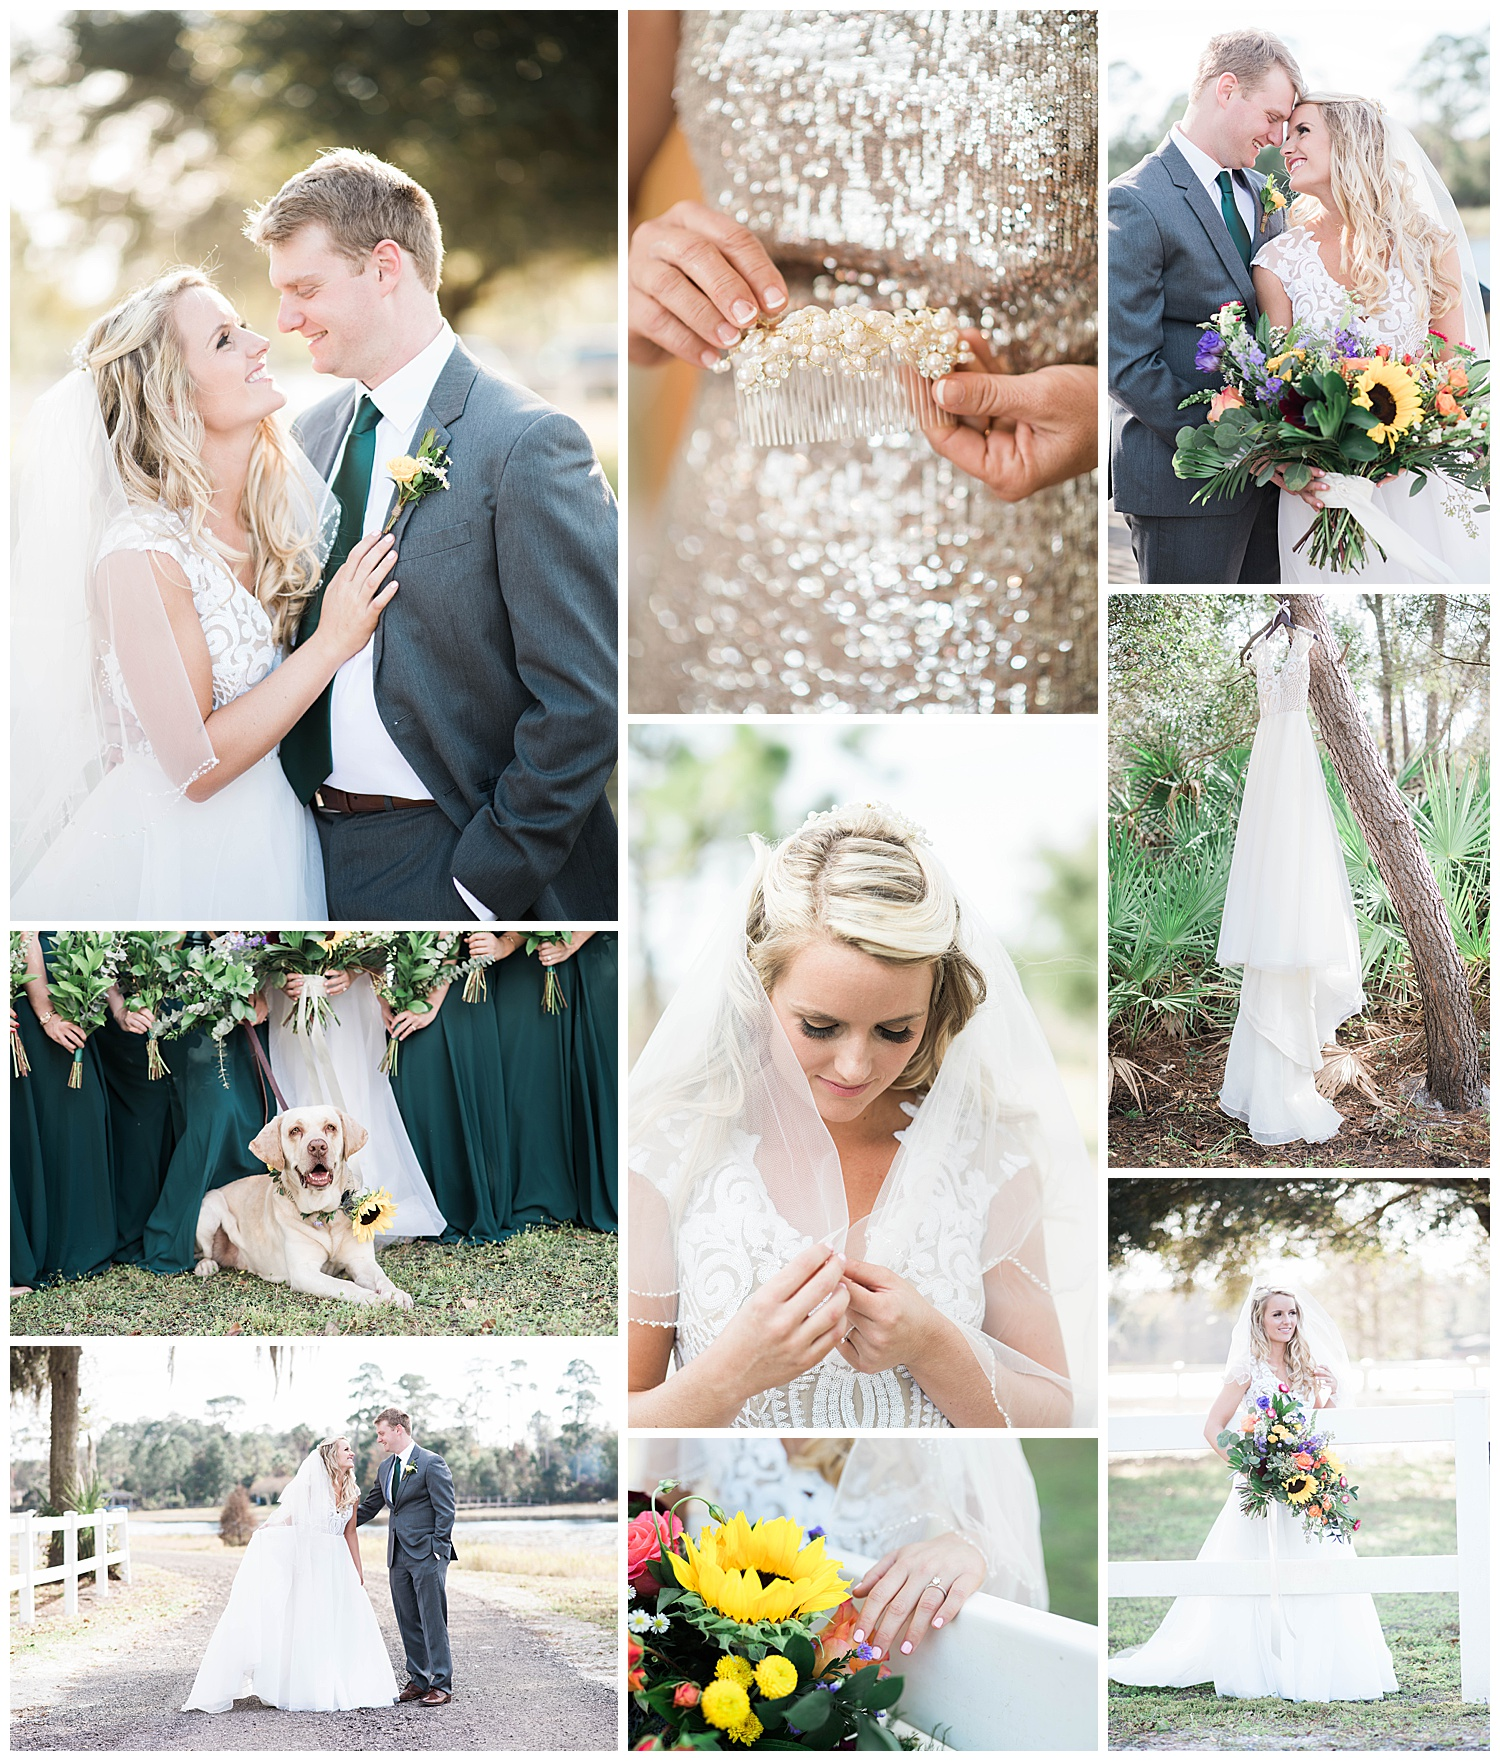 genever florida outdoor wedding bolt_0070.jpg